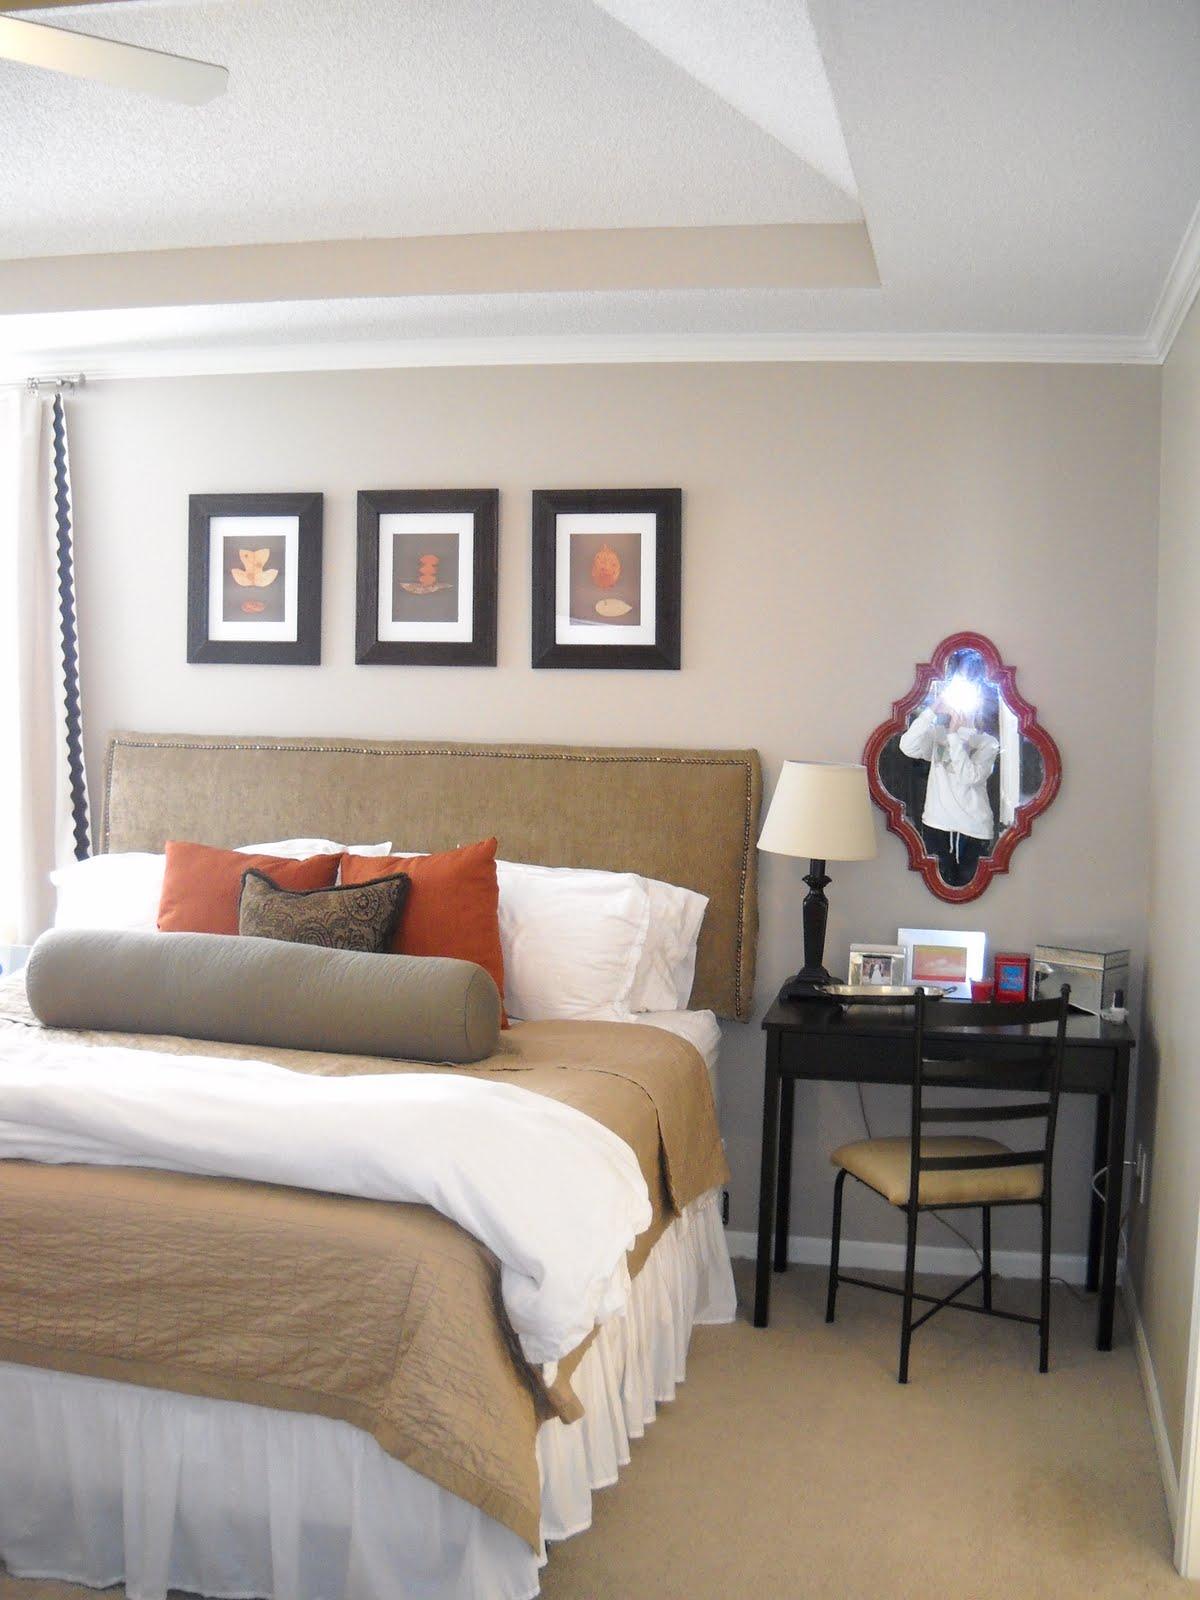 Master Bedroom Redo master bedroom makeover - suburban spunk! - diy show off ™ - diy